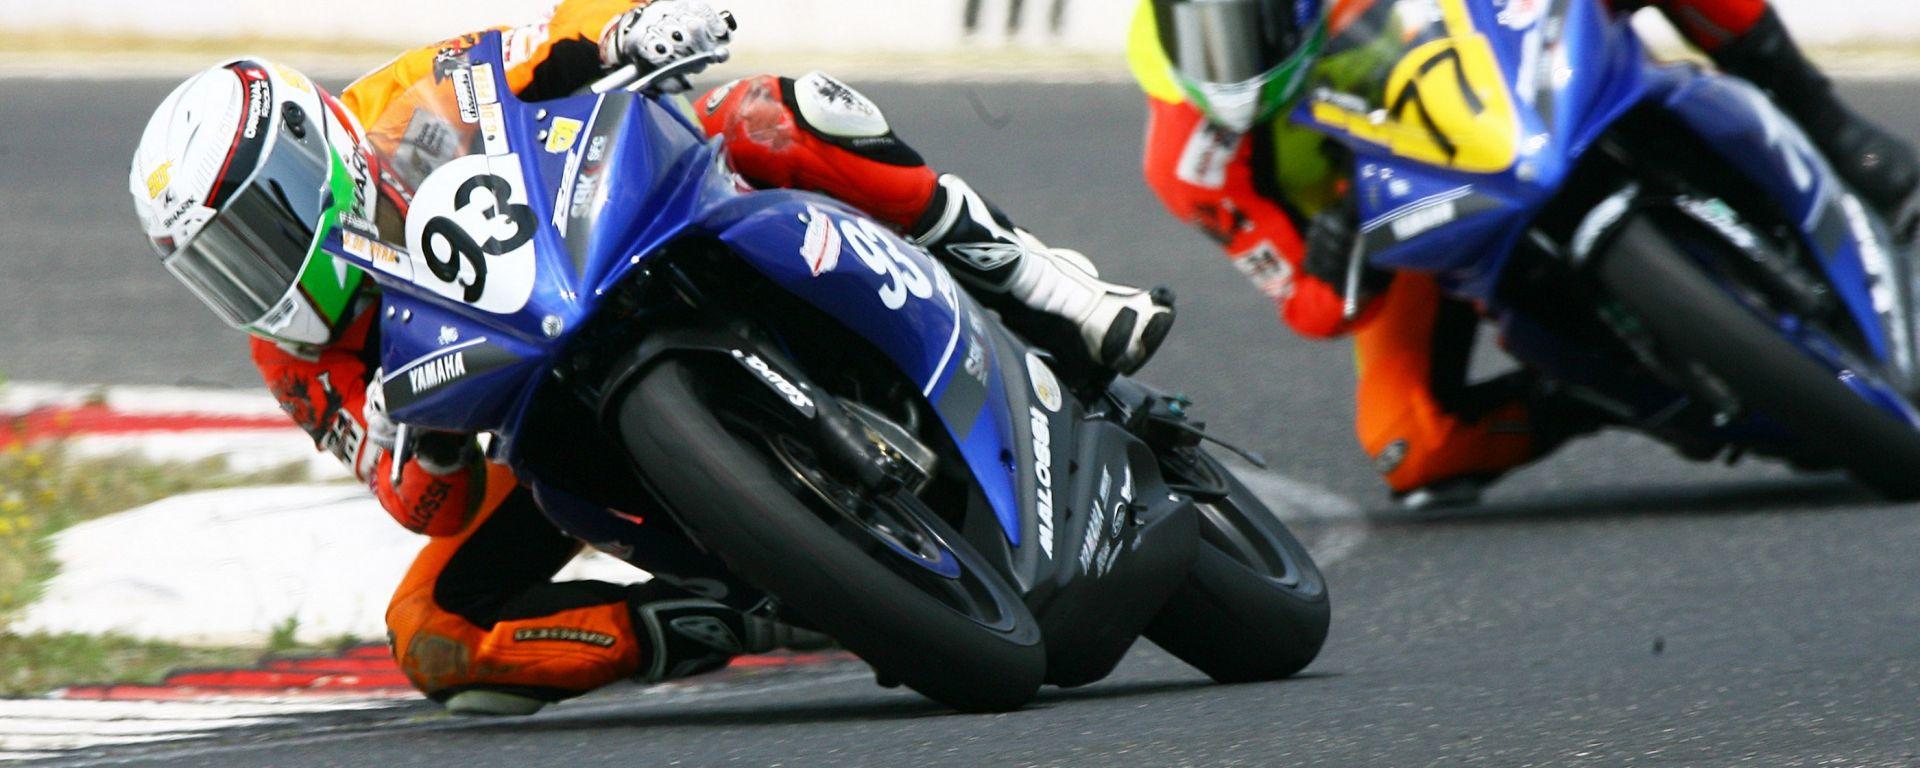 Yamaha R125 Cup 2014: aperte le iscrizioni